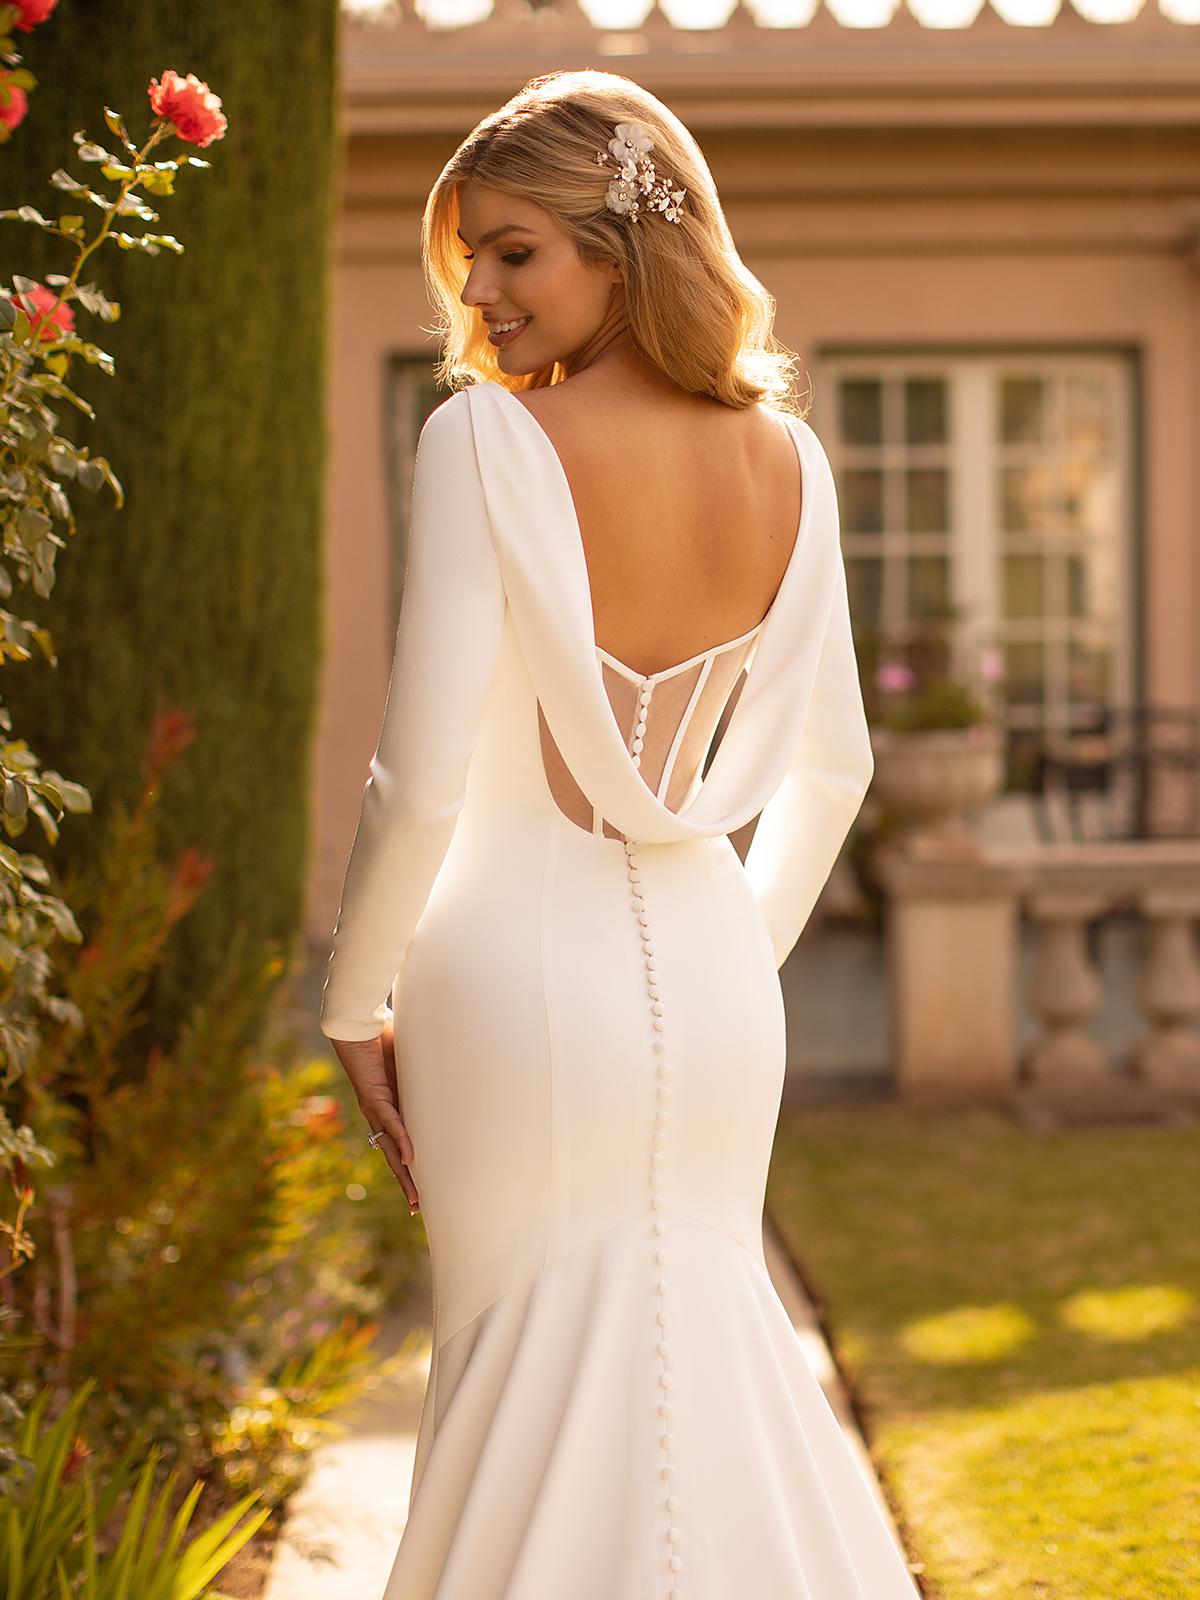 10 Gorgeous Wedding Dresses that Flatter Your Curves – Moonlight Bridal – Val Stefani – Bridal Musings – J6791_C